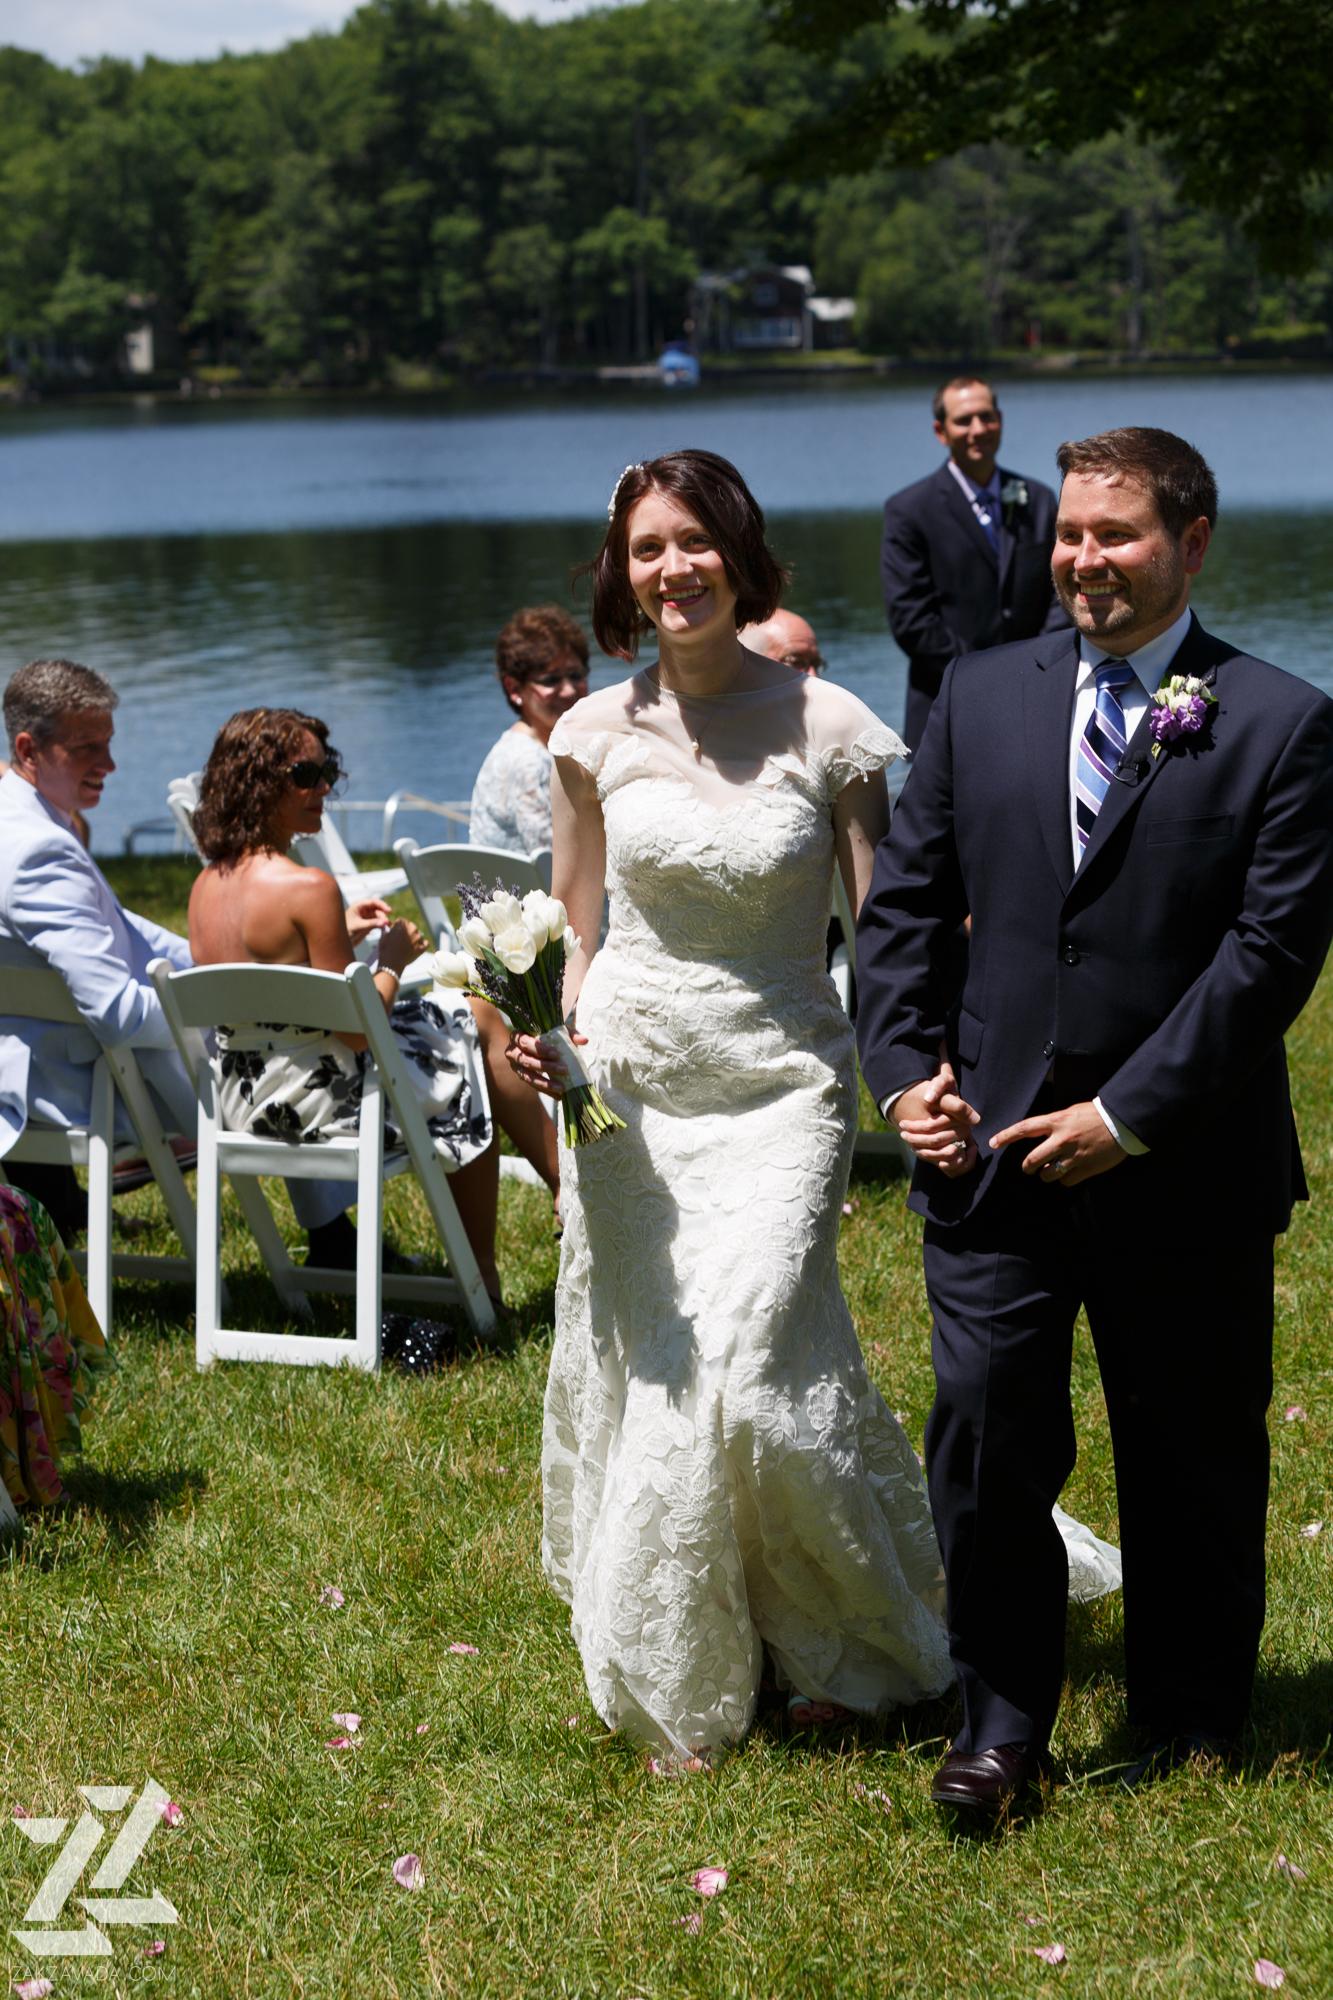 scranton-wedding-photography-zak-zavada-ruddyBelcastroWedding-396.jpg